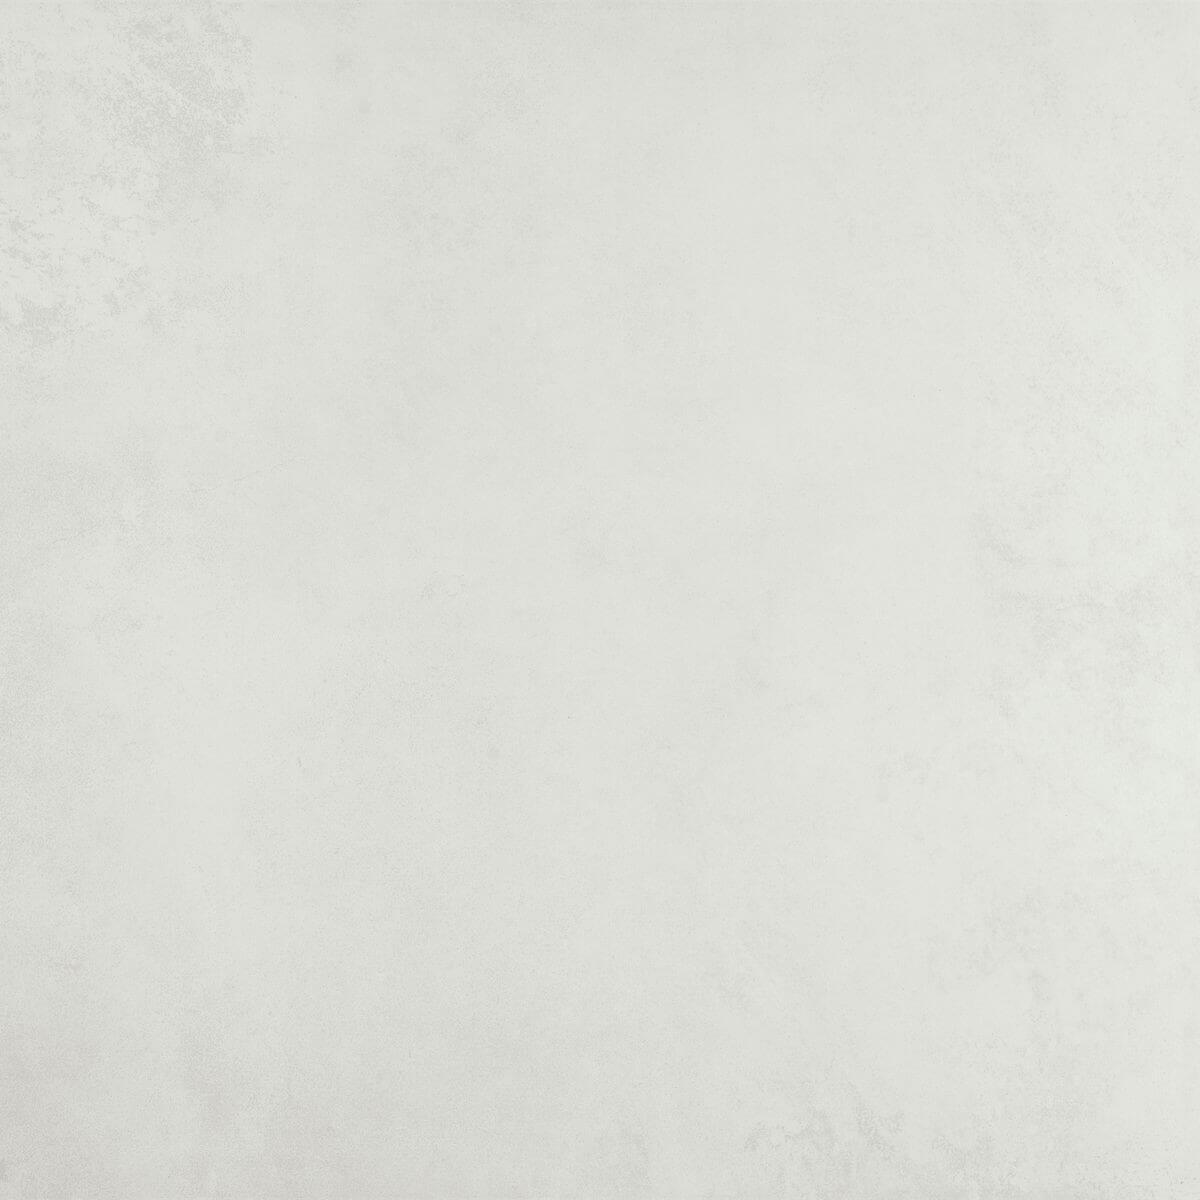 Carrelage aspect Béton Tech White mat 30x60 cm